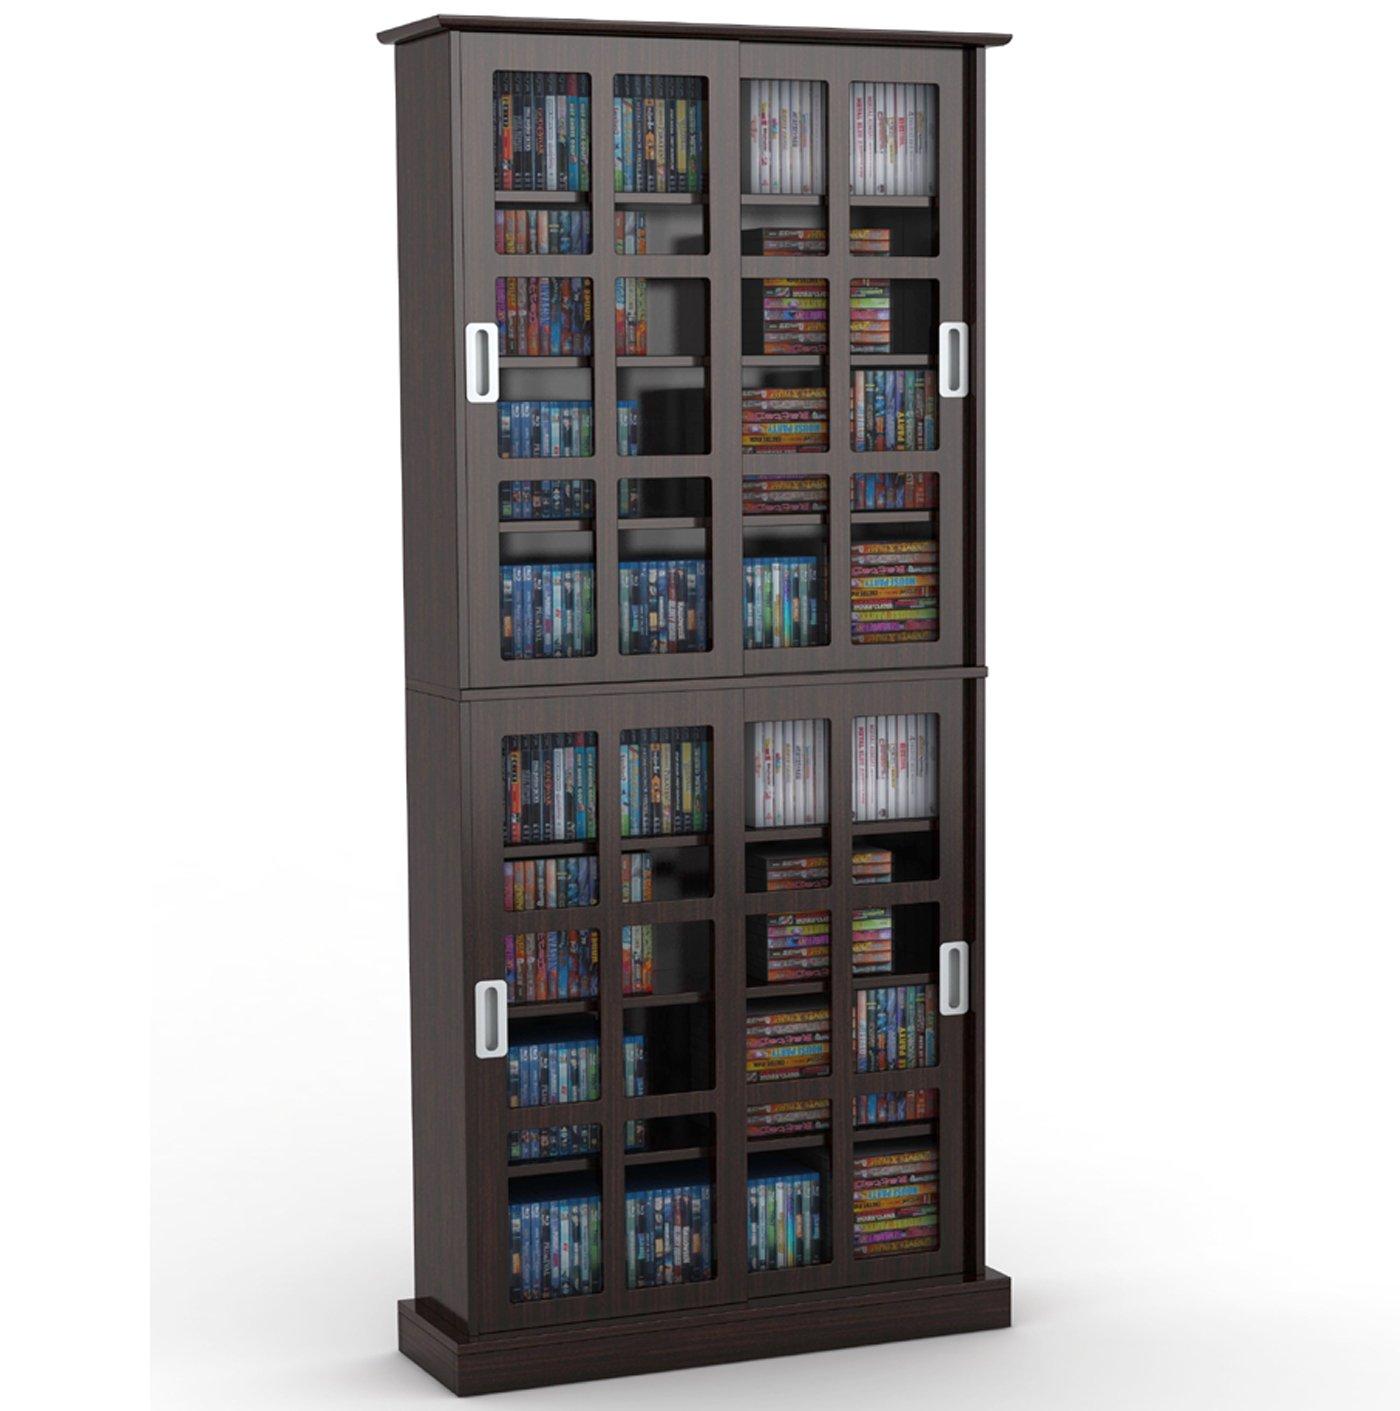 Amazon.com Atlantic Windowpane 720 Multimedia Storage Wood Cabinet in Espresso Home u0026 Kitchen  sc 1 st  Amazon.com & Amazon.com: Atlantic Windowpane 720 Multimedia Storage Wood Cabinet ...